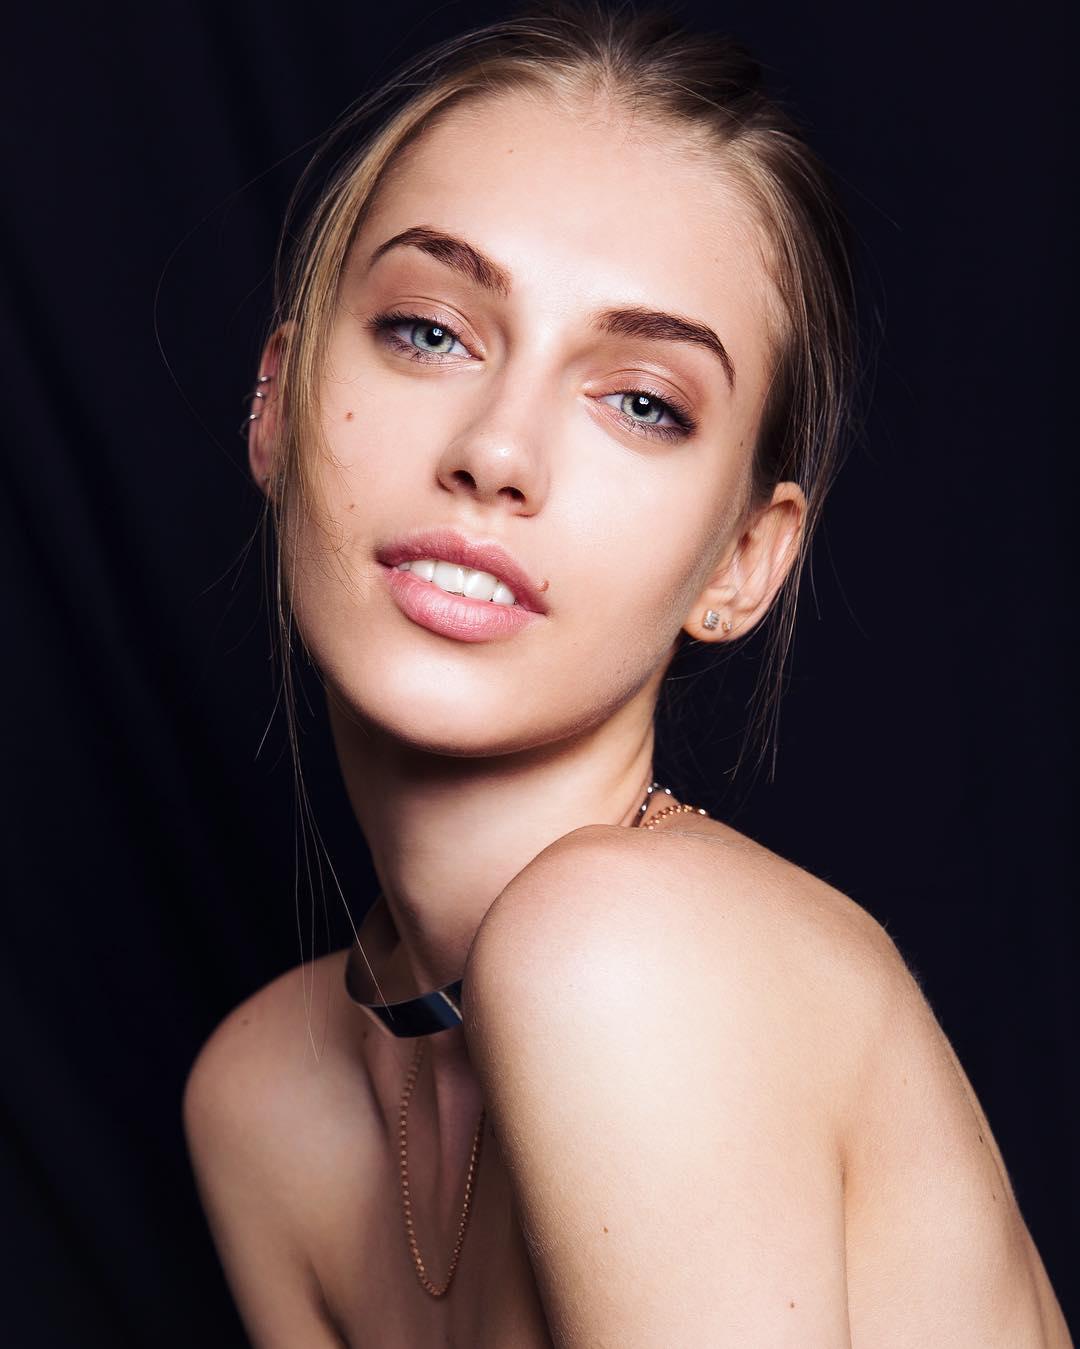 ICloud Juliana Reis naked (85 foto and video), Topless, Paparazzi, Selfie, braless 2020